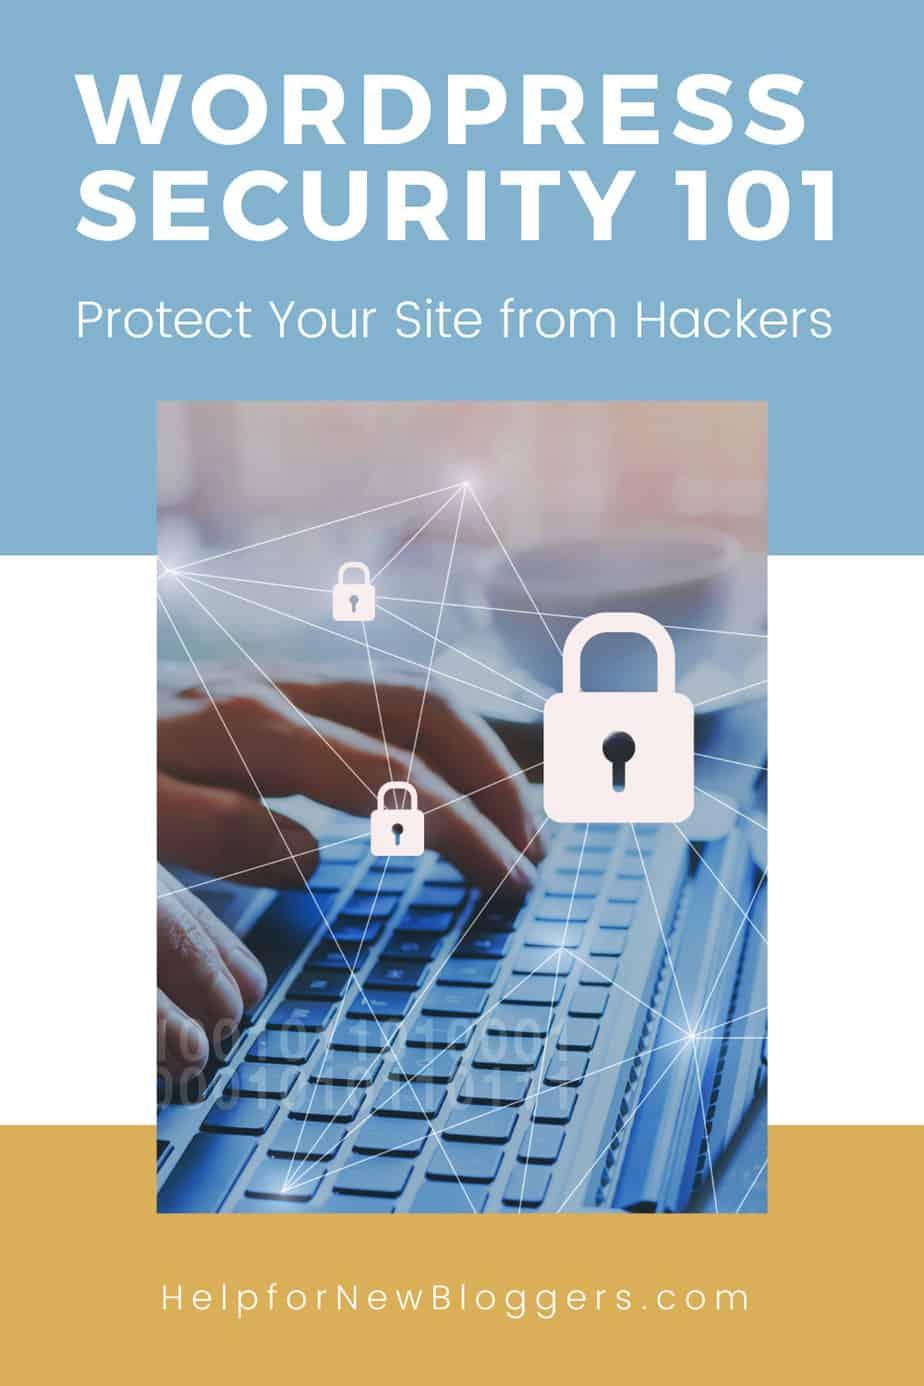 WordPress Security Tips to Prevent Hackers